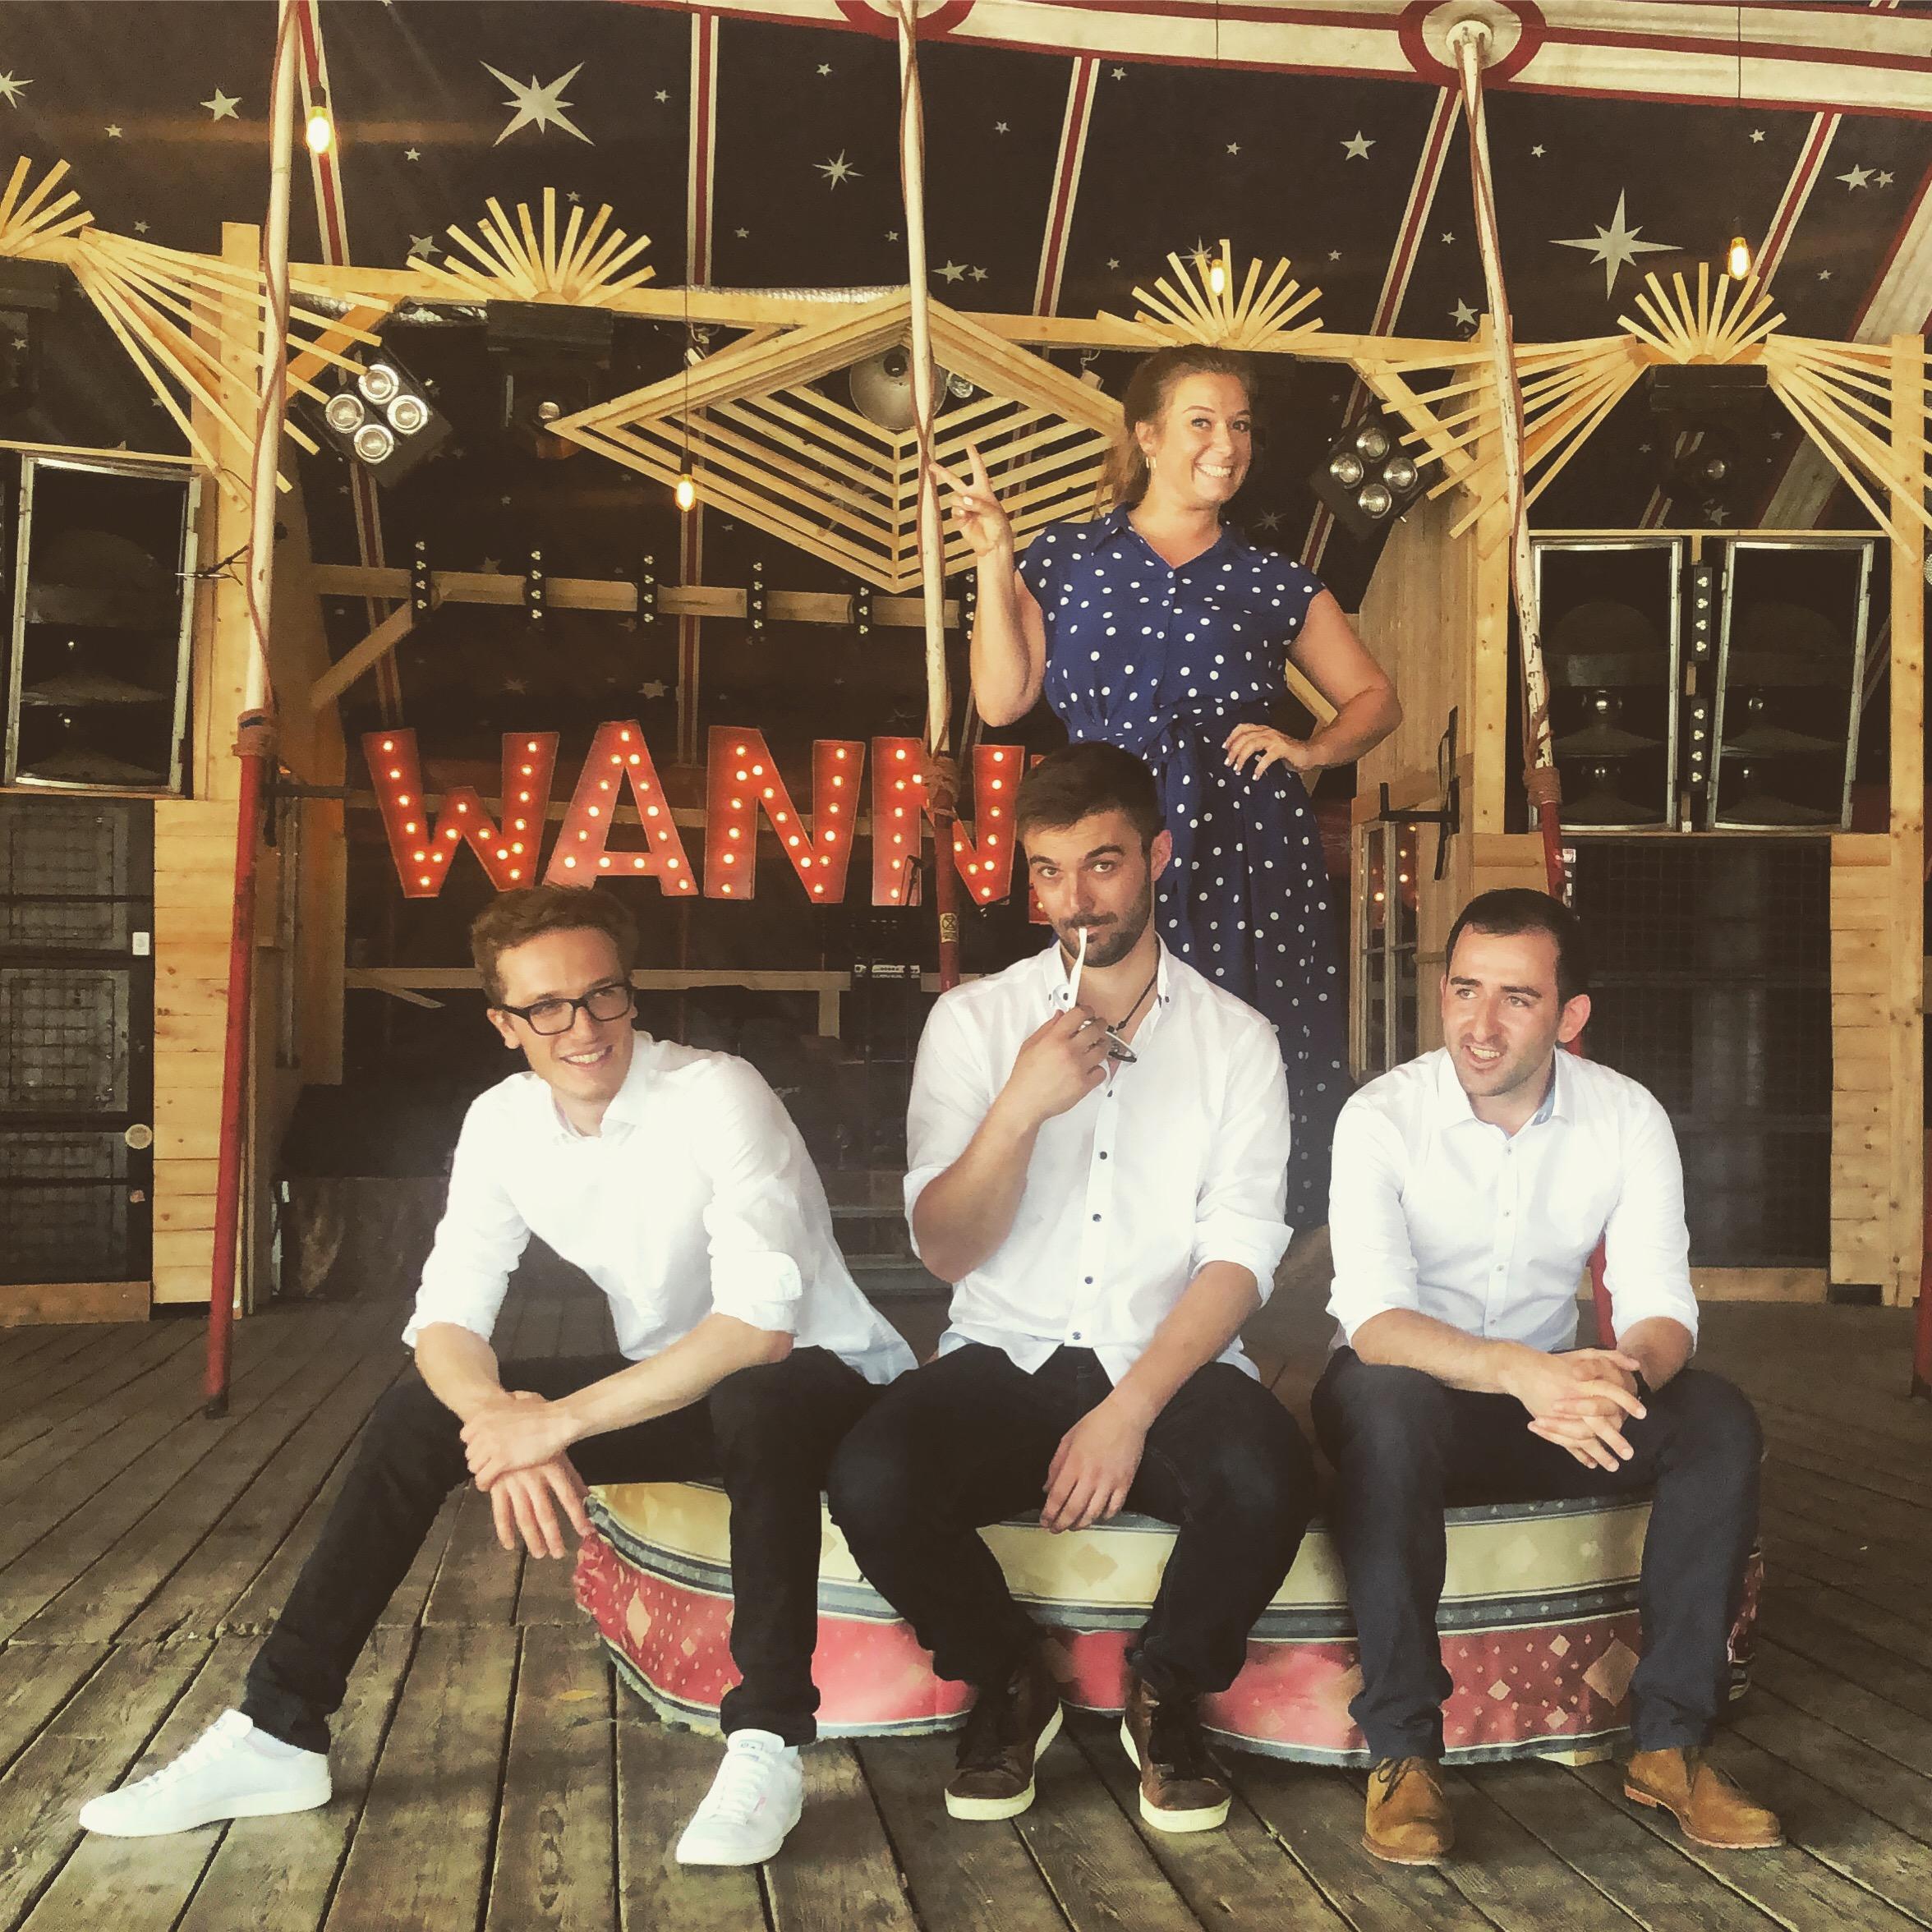 Band, Bolandi Trio, im Wannda Circus 2019